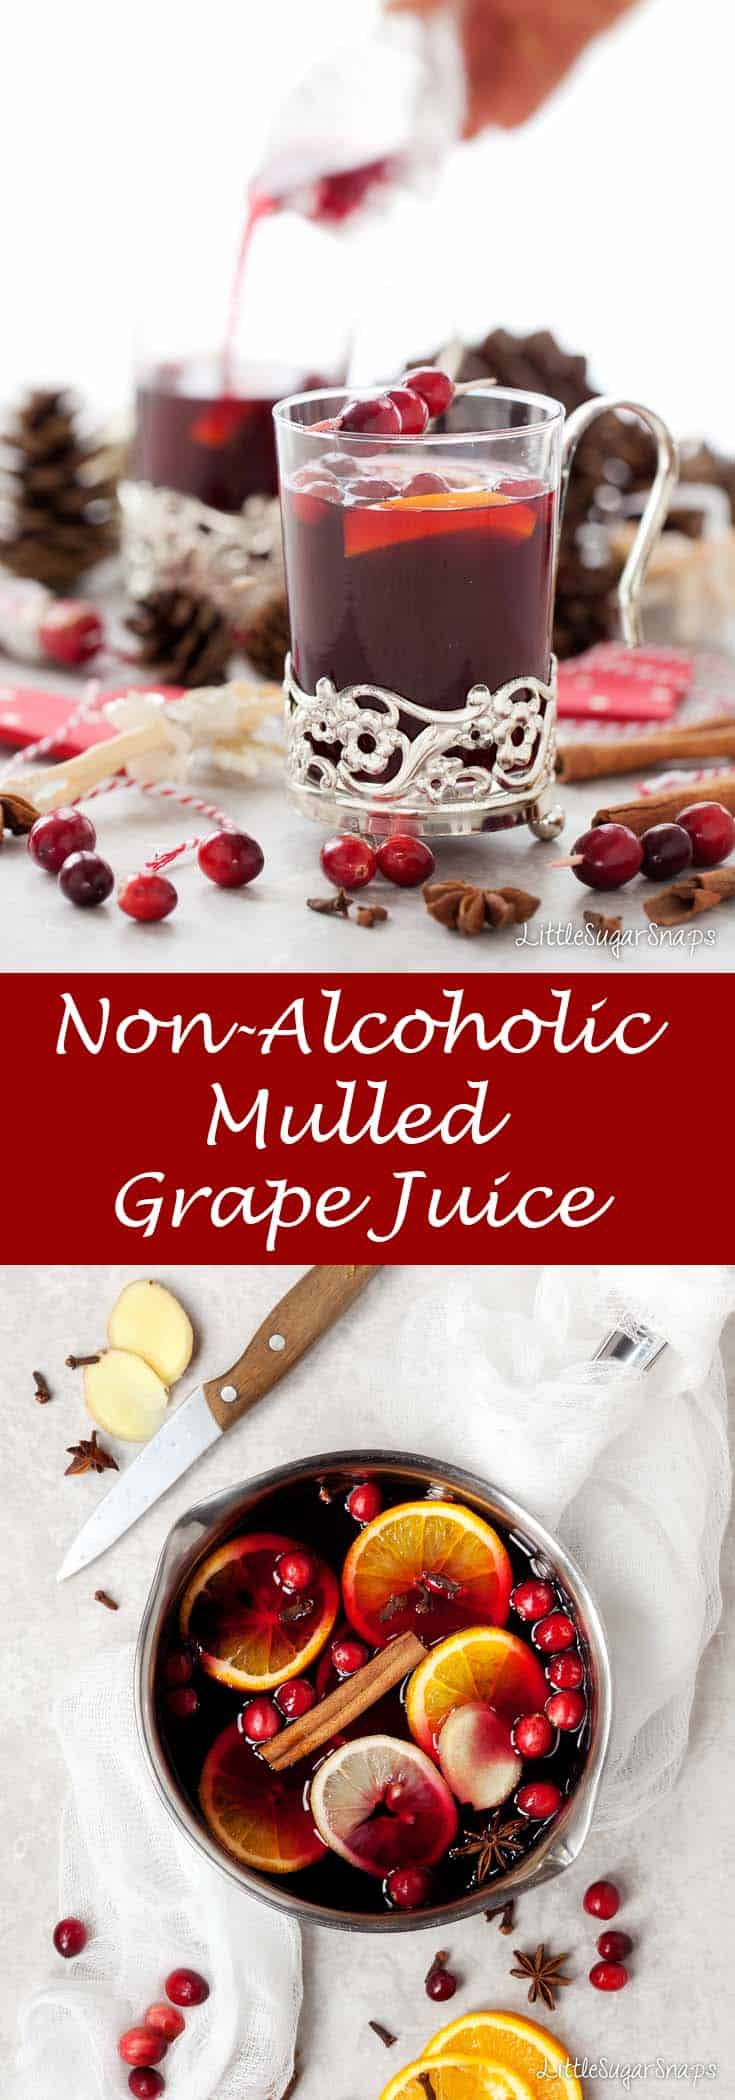 Mulled Grape Juice #virginmulledwine #mulledgrape #mulledjuice #mulled